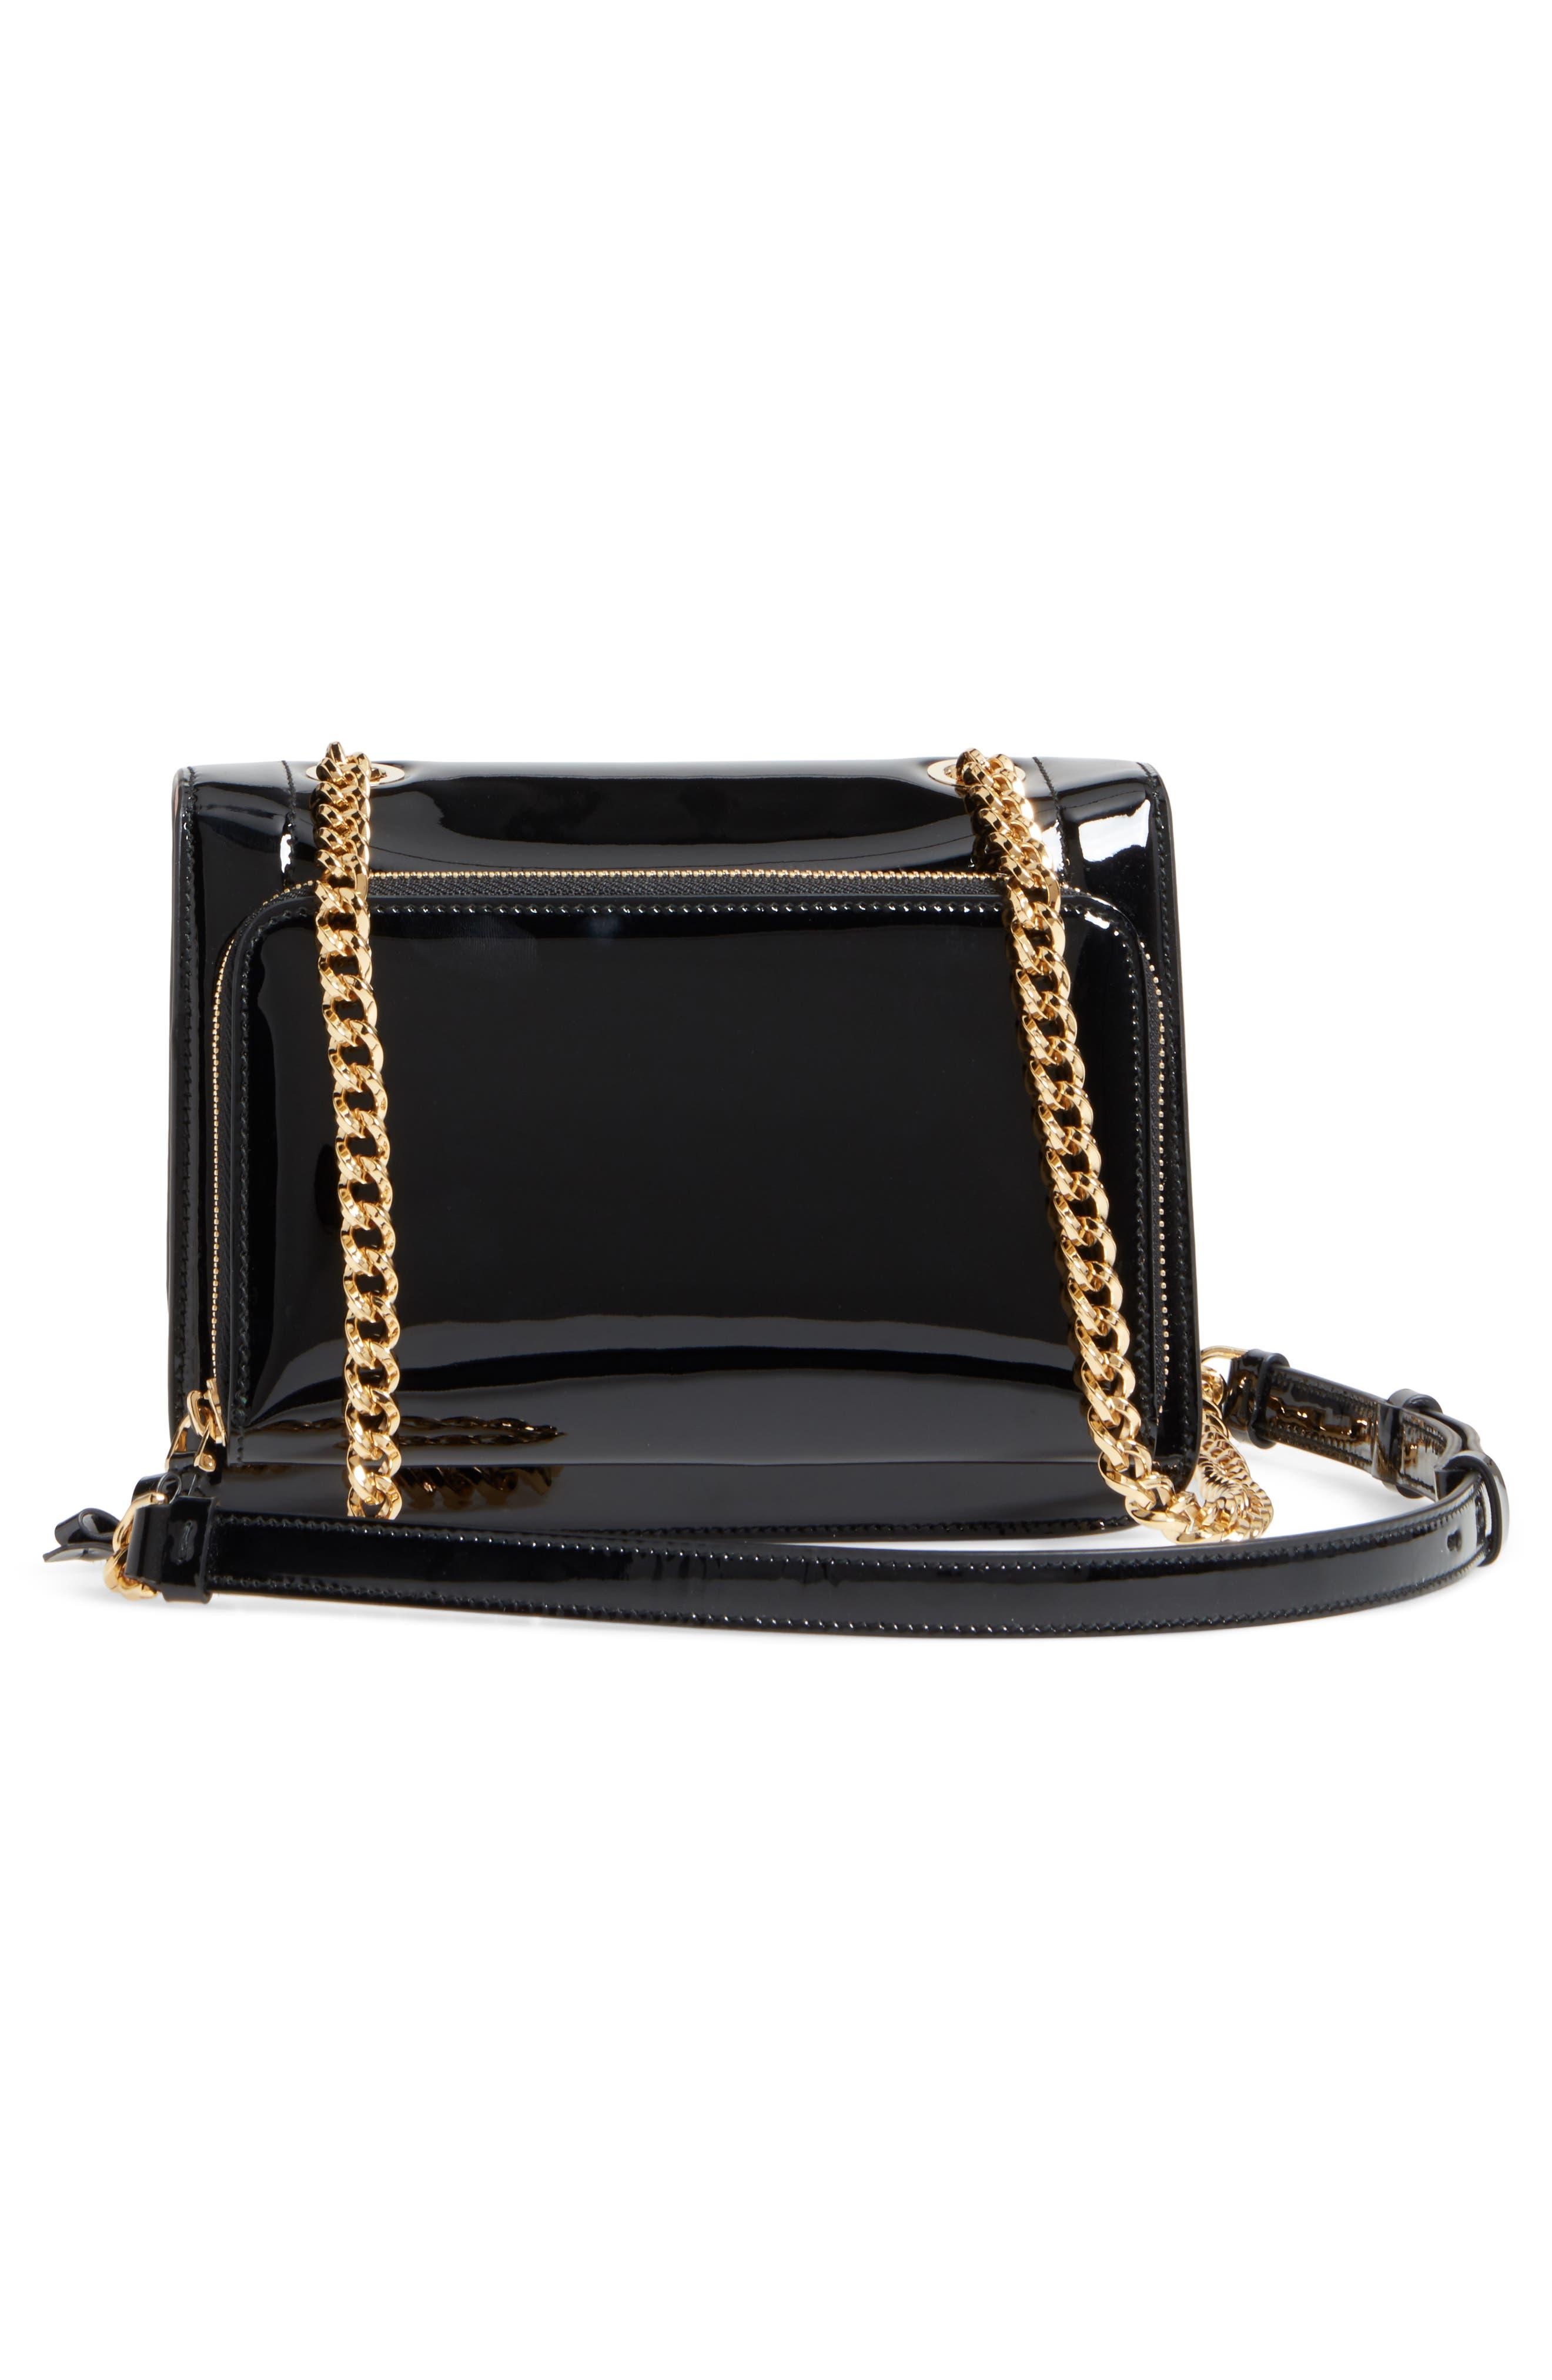 Vara Patent Leather Shoulder Bag,                             Alternate thumbnail 3, color,                             NERO/ BONBON